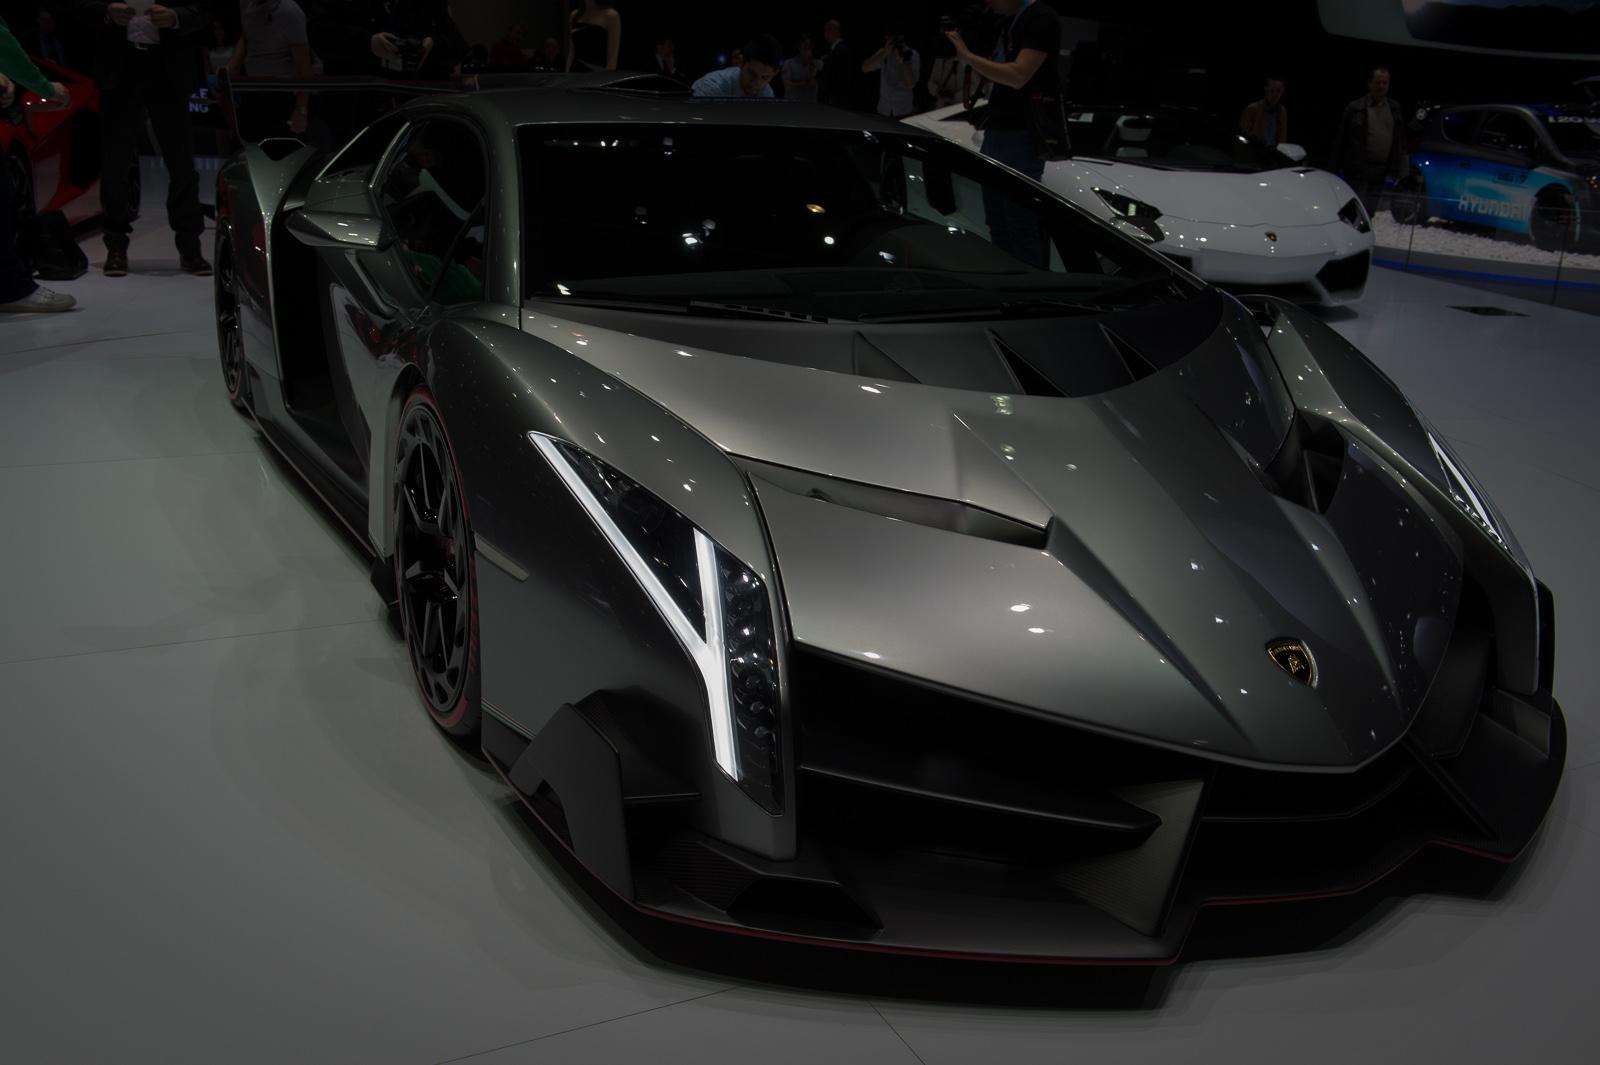 Fotos Genf 2013 Lamborghini Veneno Quot Auto Geil Quot